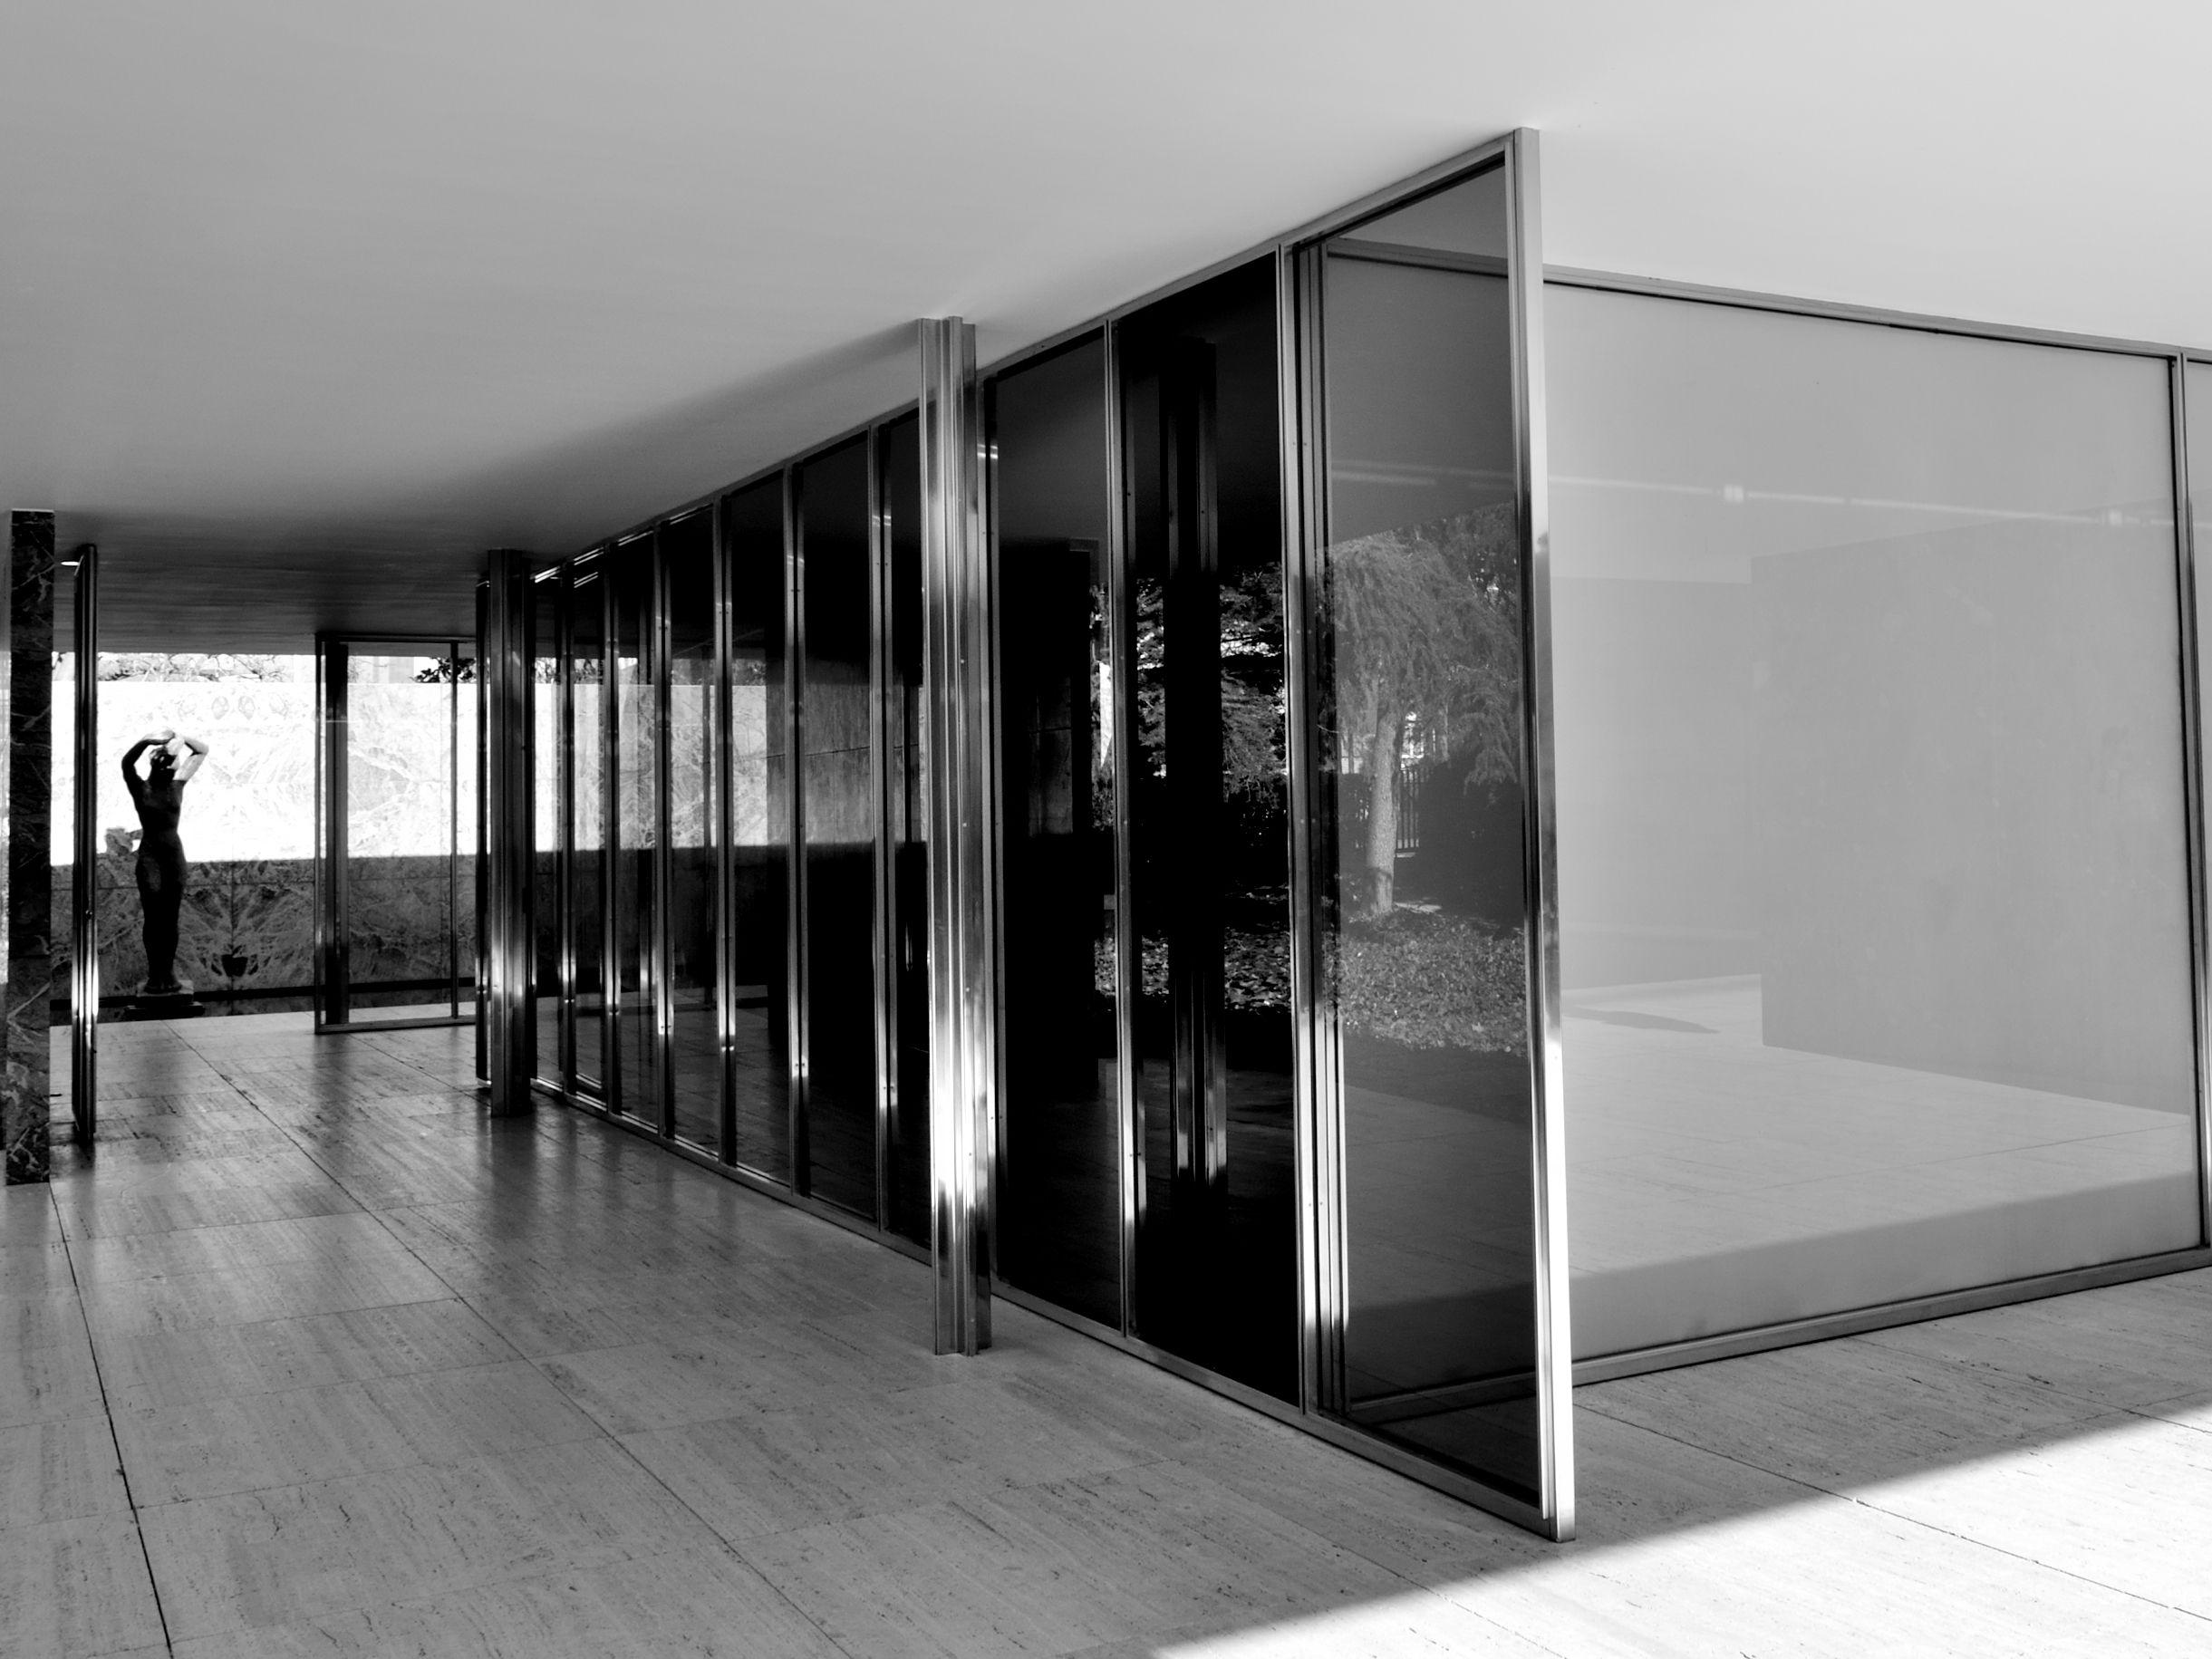 mies van der rohe barcelona pavilion 1929 mies van der rohe pinterest pavilion modern. Black Bedroom Furniture Sets. Home Design Ideas